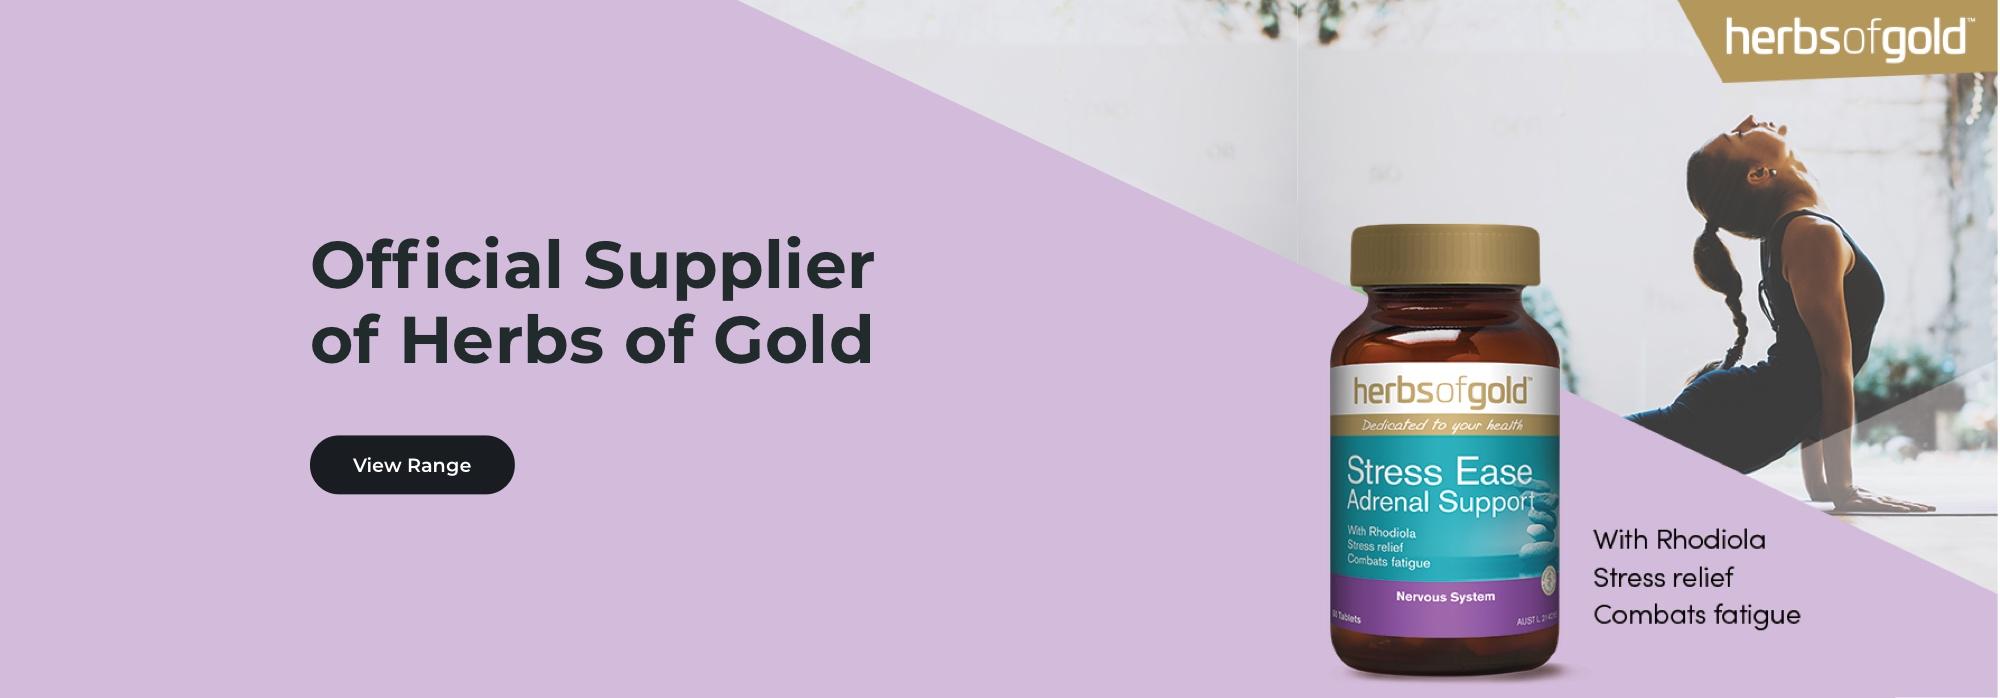 Slider 2 - Herbs of Gold